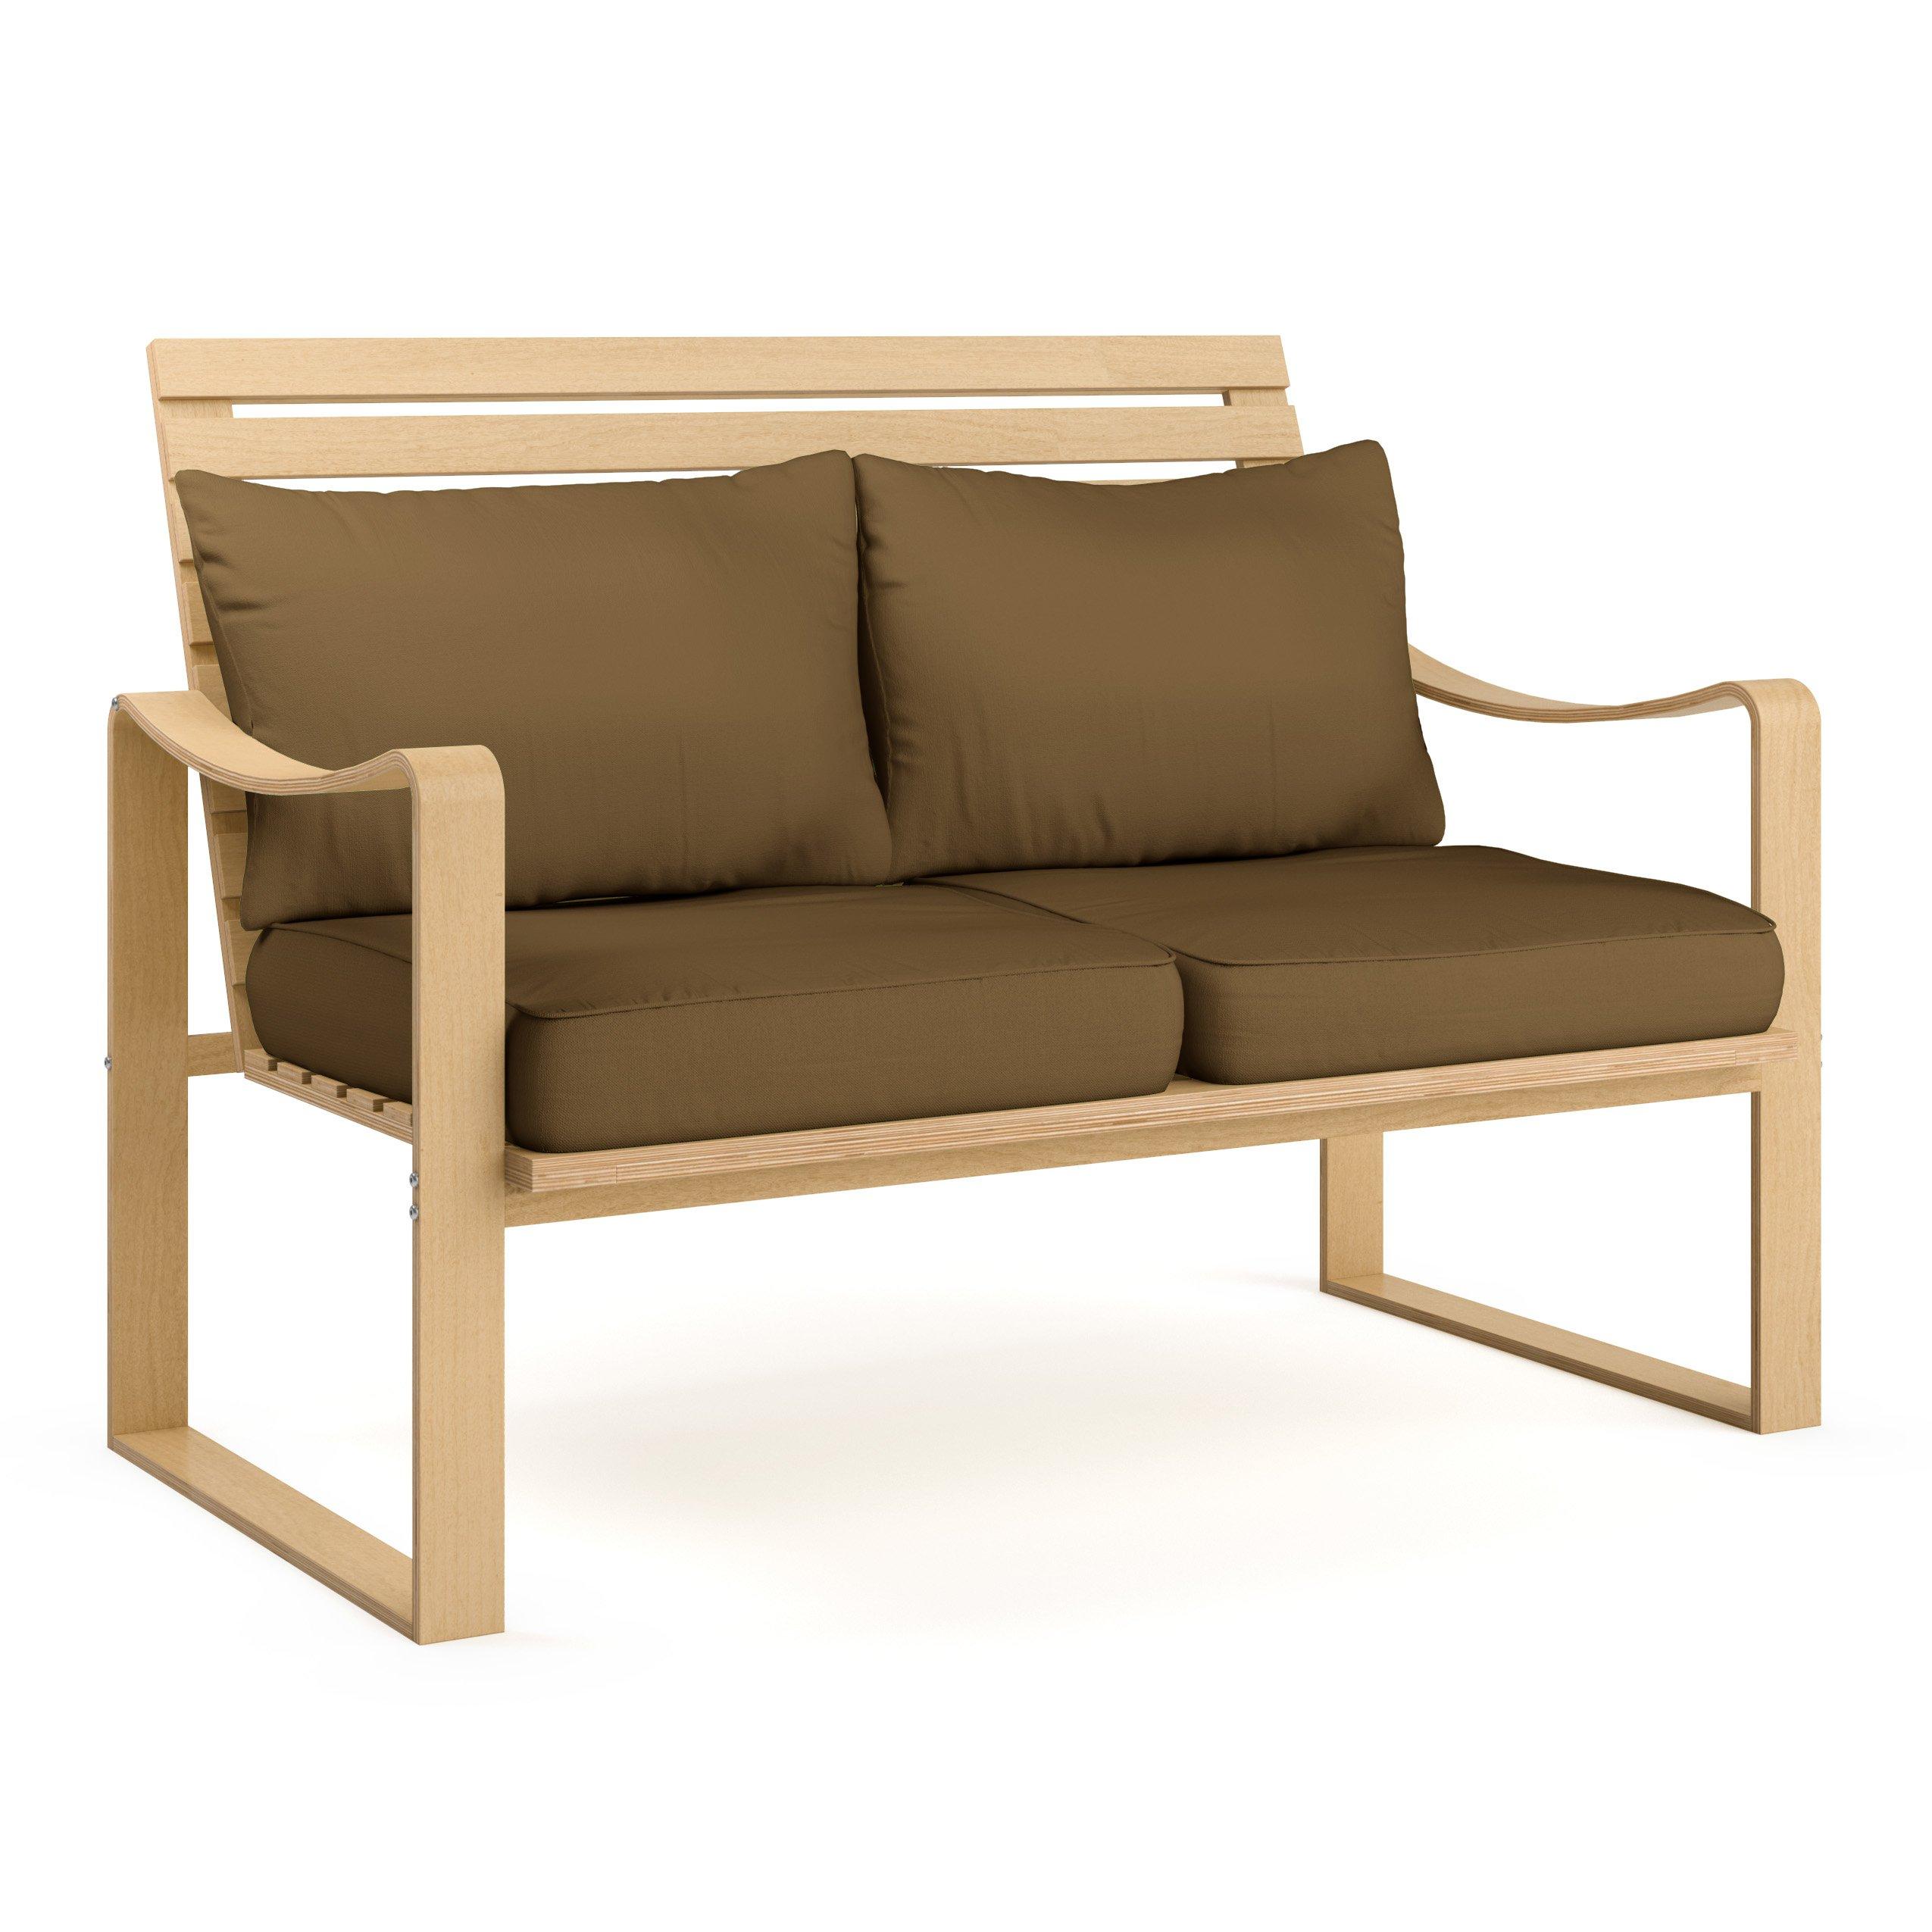 CorLiving LCQ-827-S Aquios Bentwood Sofa, Warm Brown